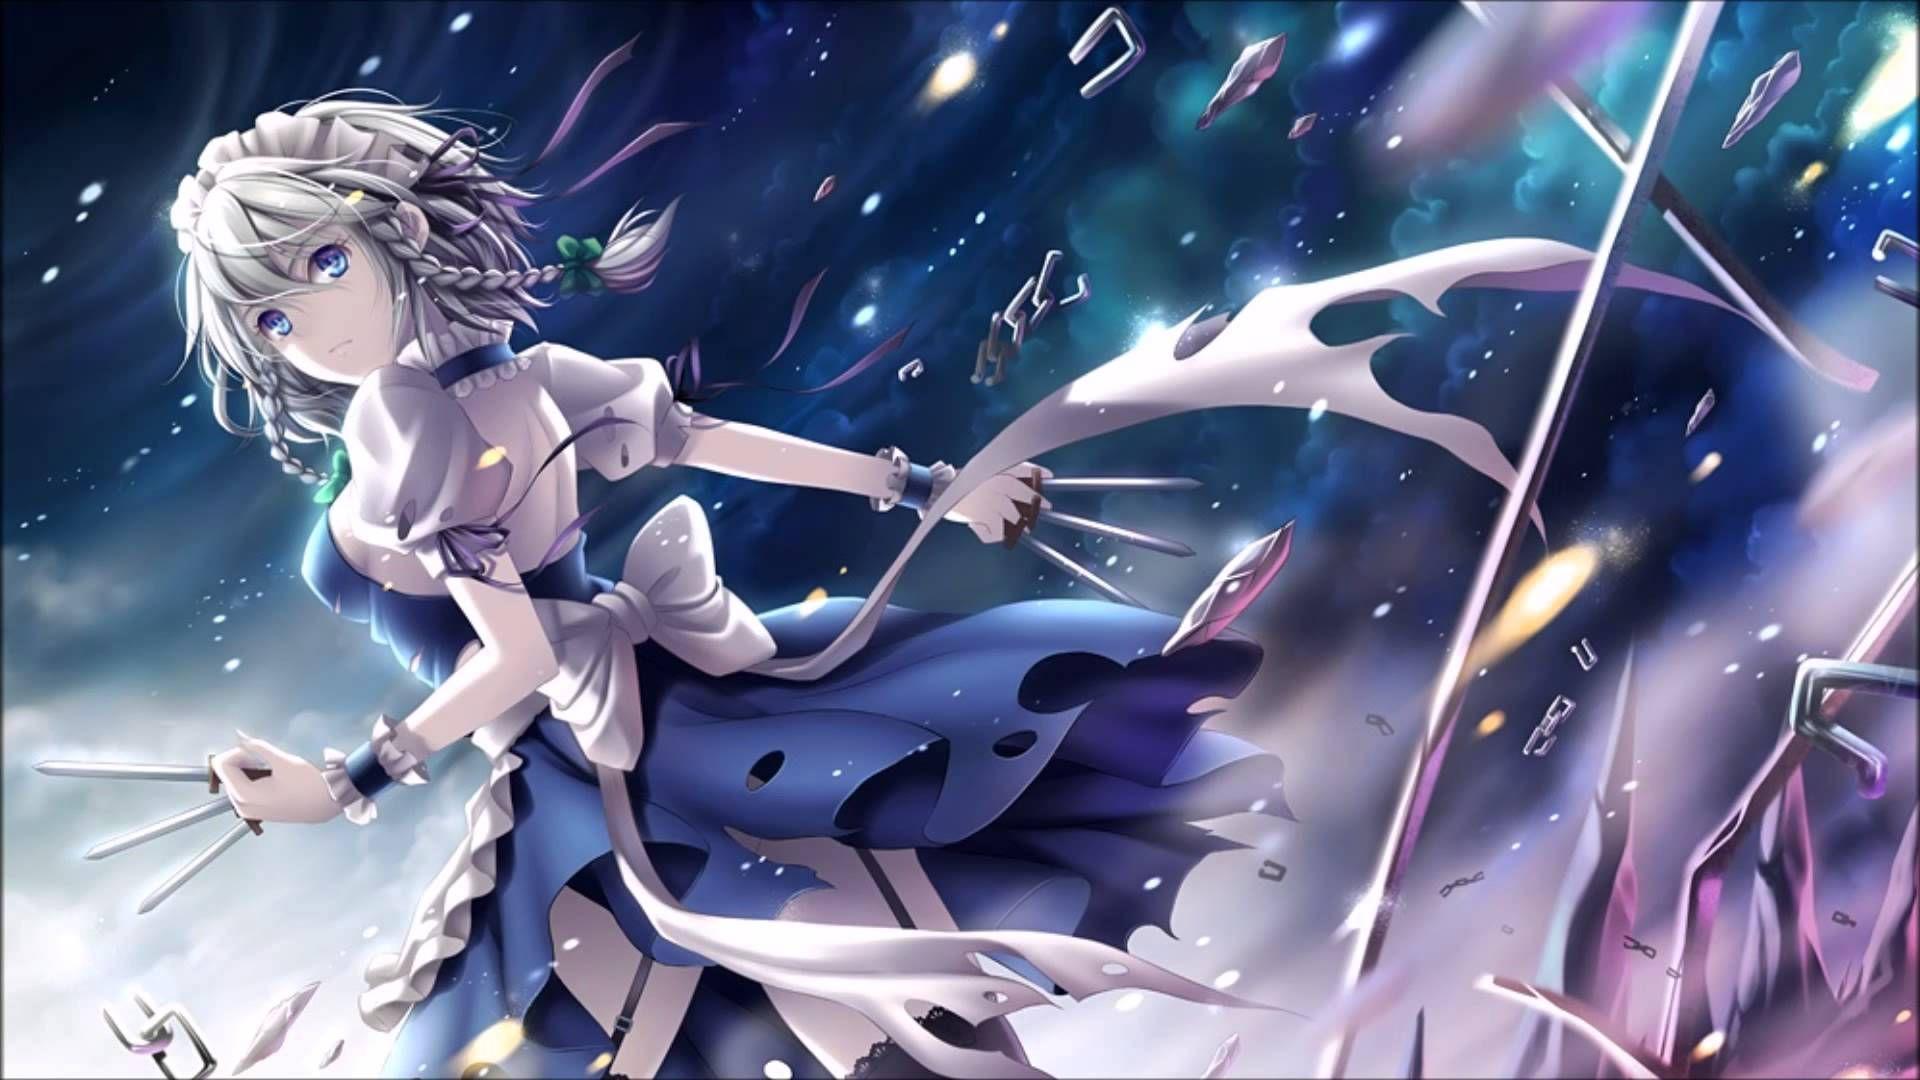 music warriyo mortals feat laura brehm image info touhou project name of the girl sakuya izayoi アニメの女の子 東方 かわいい 漫画の写真